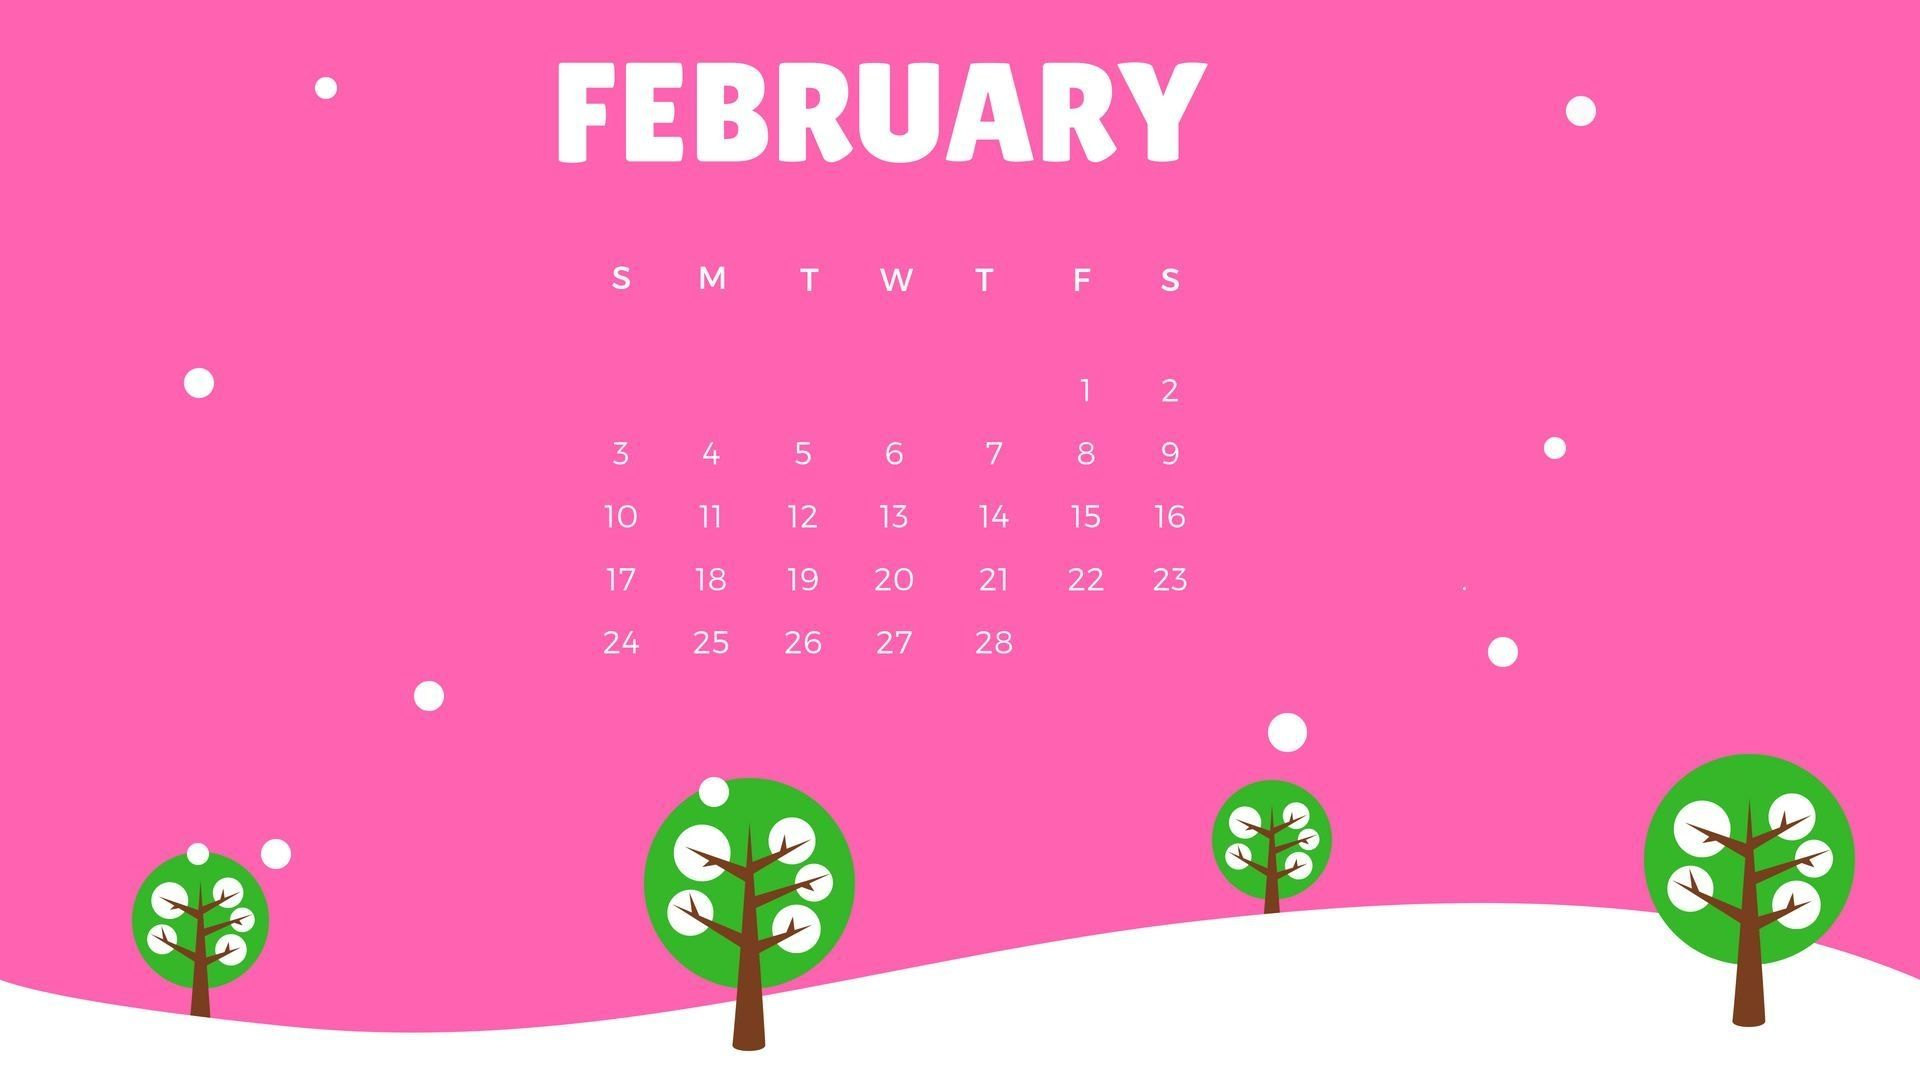 2019 February Wallpaper Calendars february 2019 calendar wallpaper calendar 2019 wallpapersfebruary